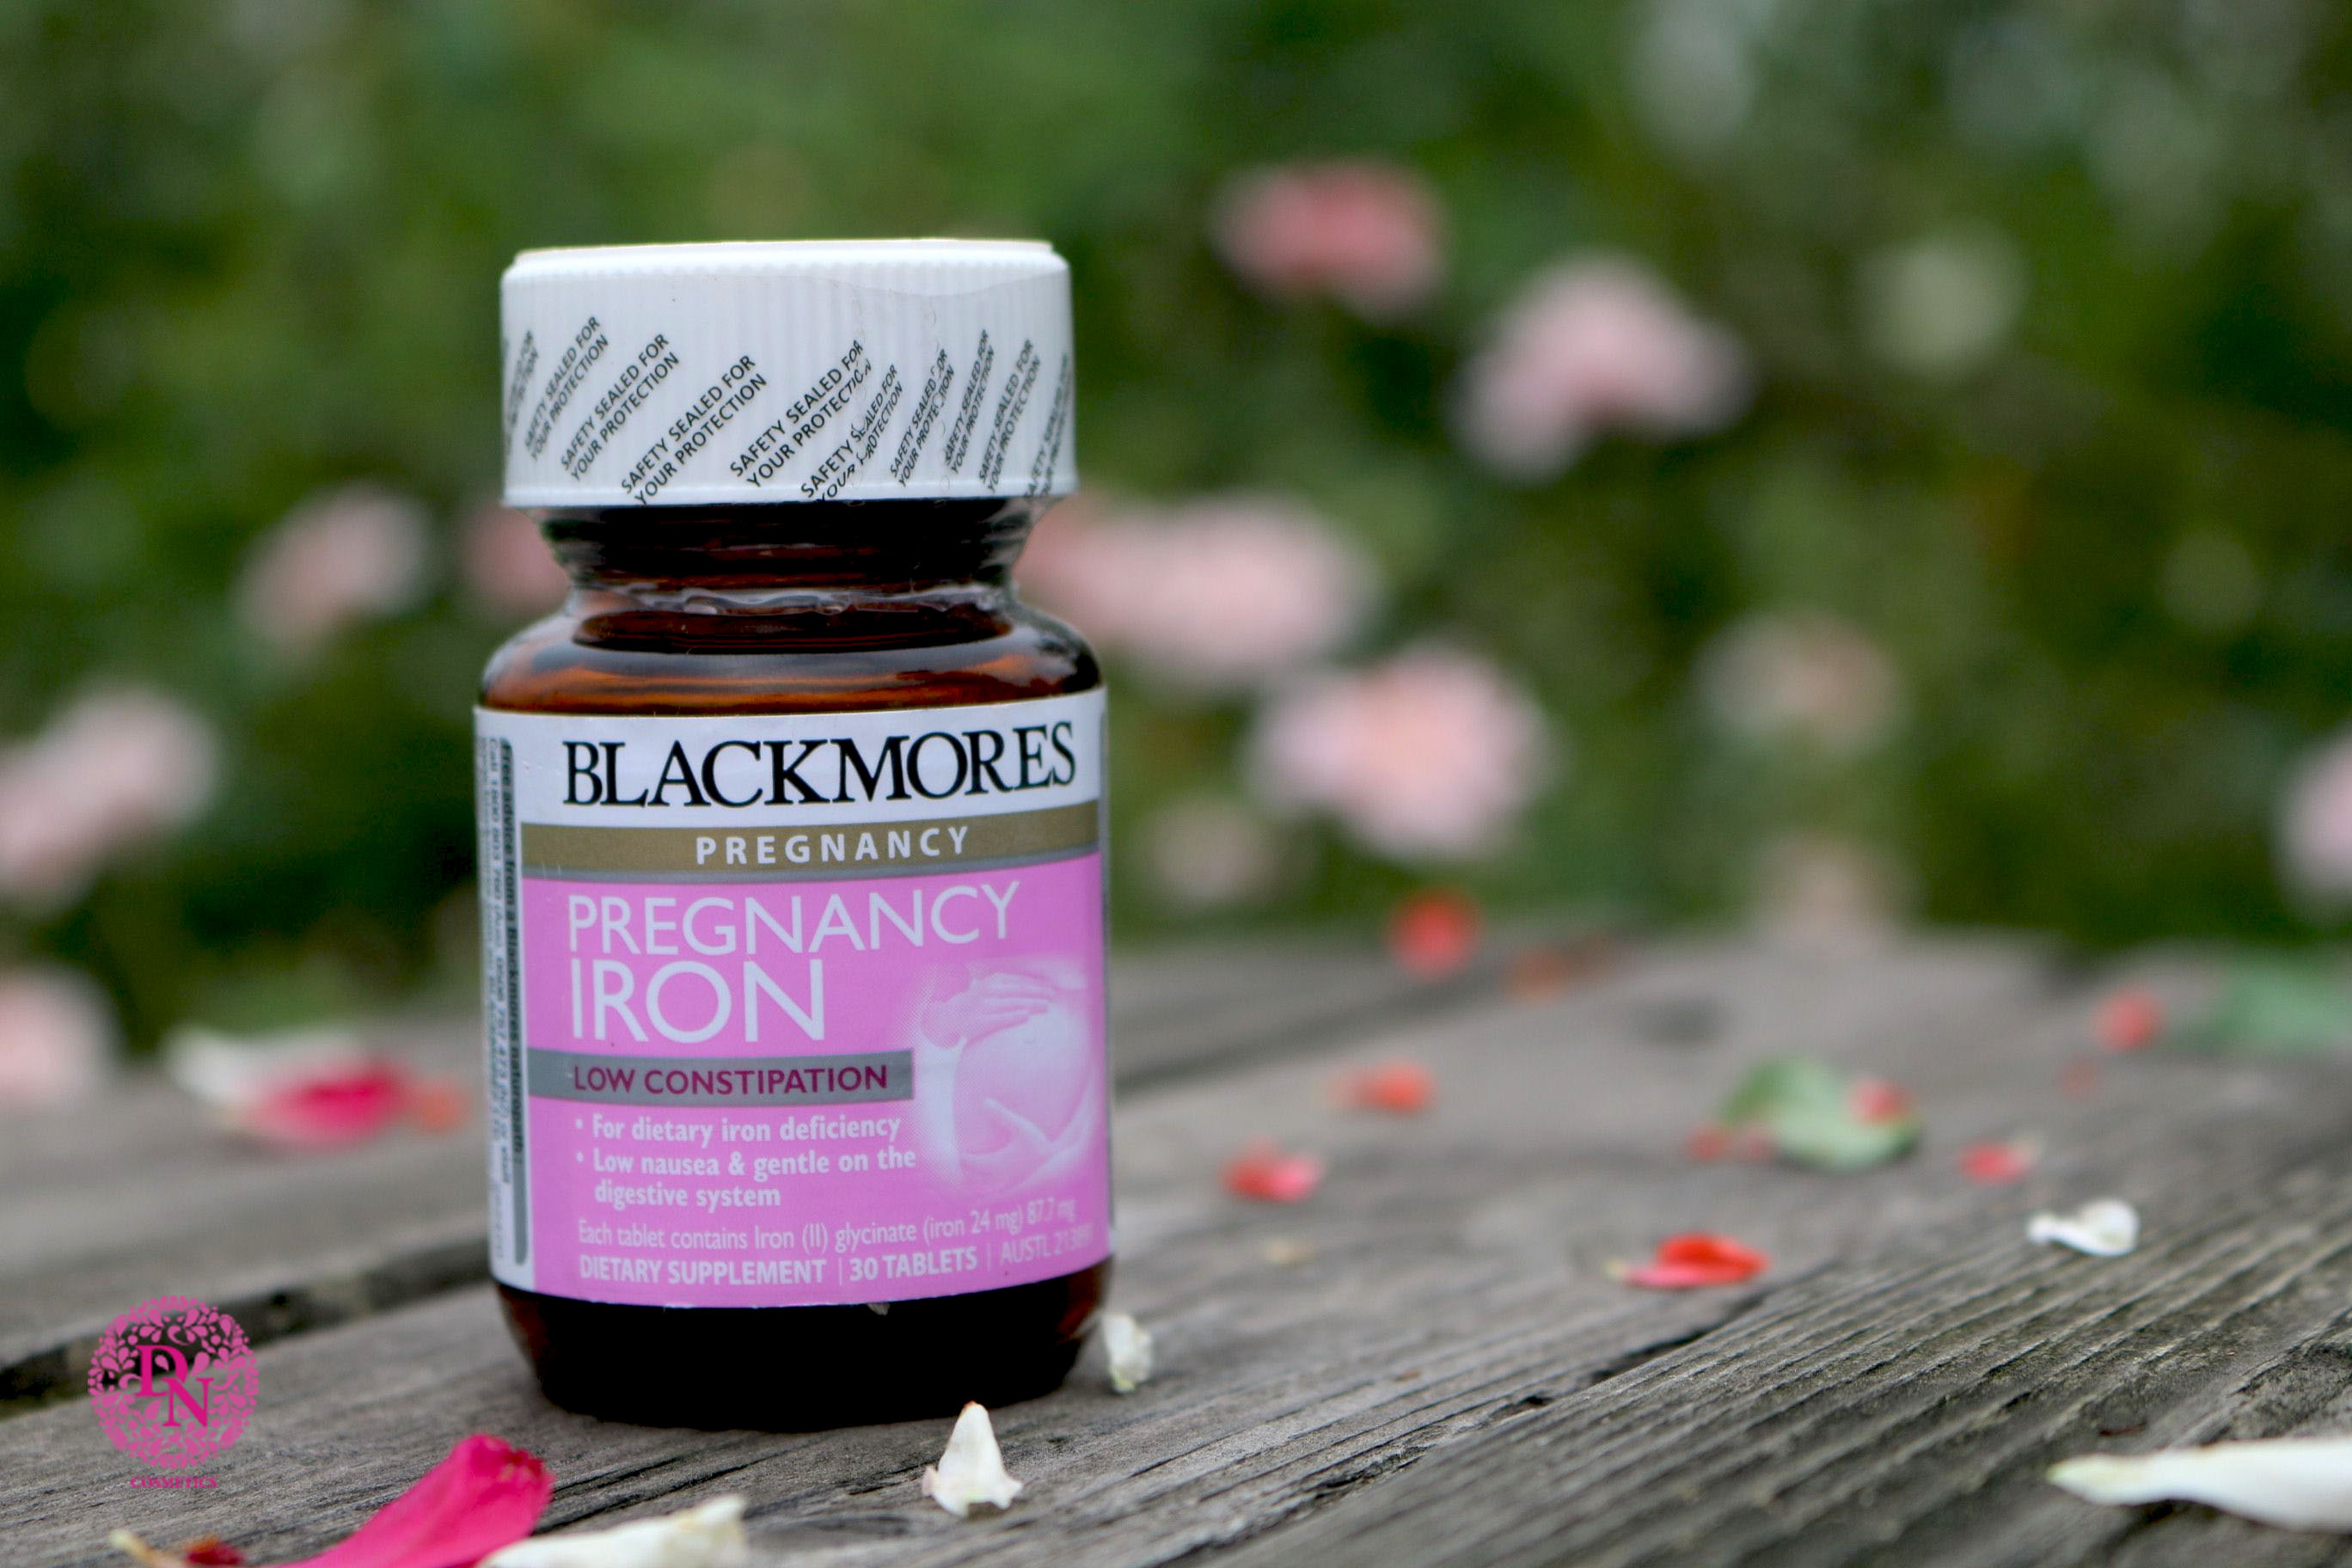 vien-uong-sat-blackmores-pregnancy-iron-30-vien-1